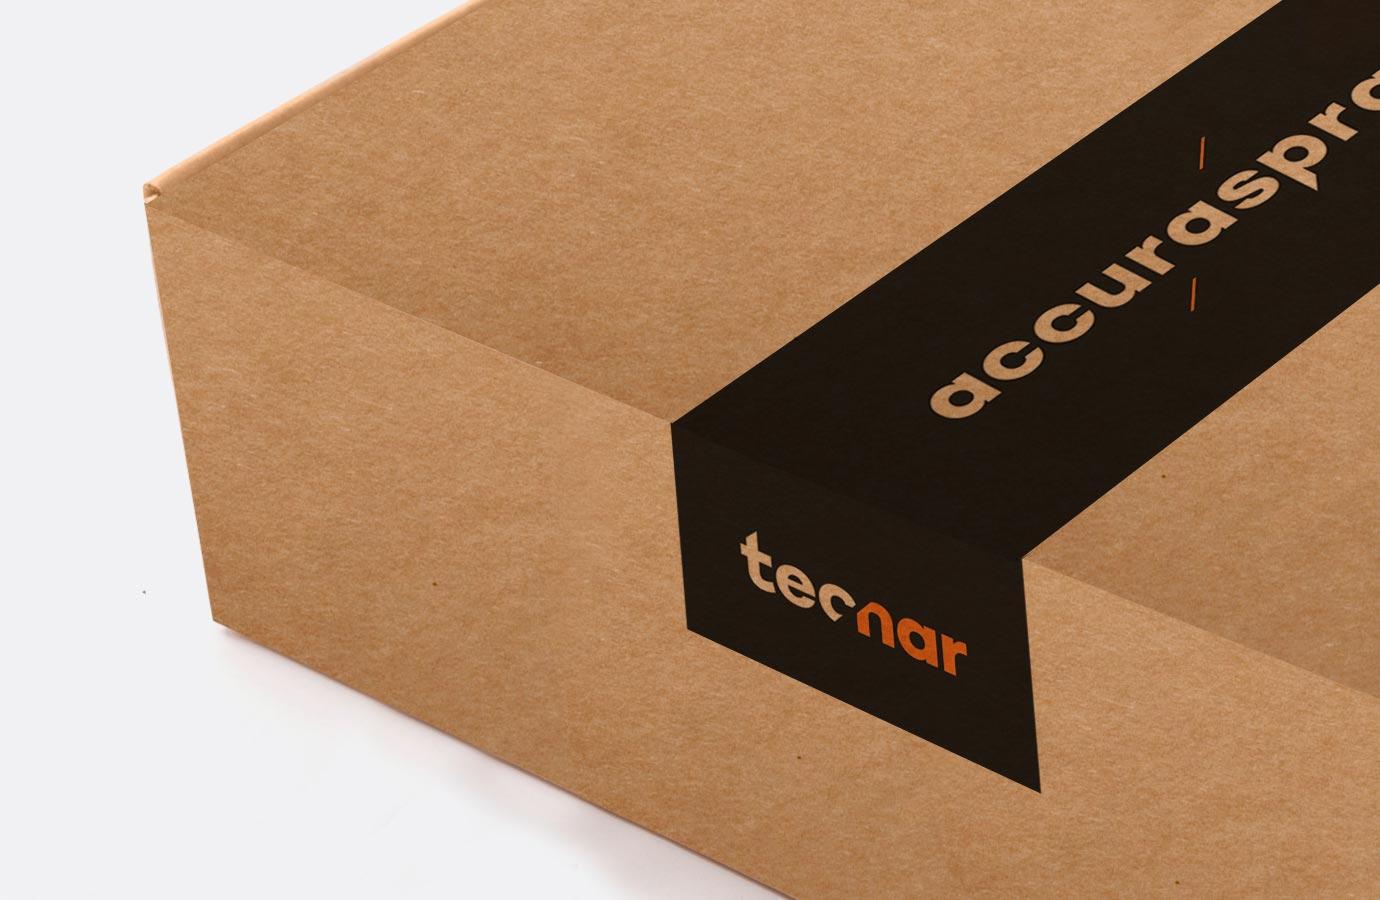 Emballage Tecnar